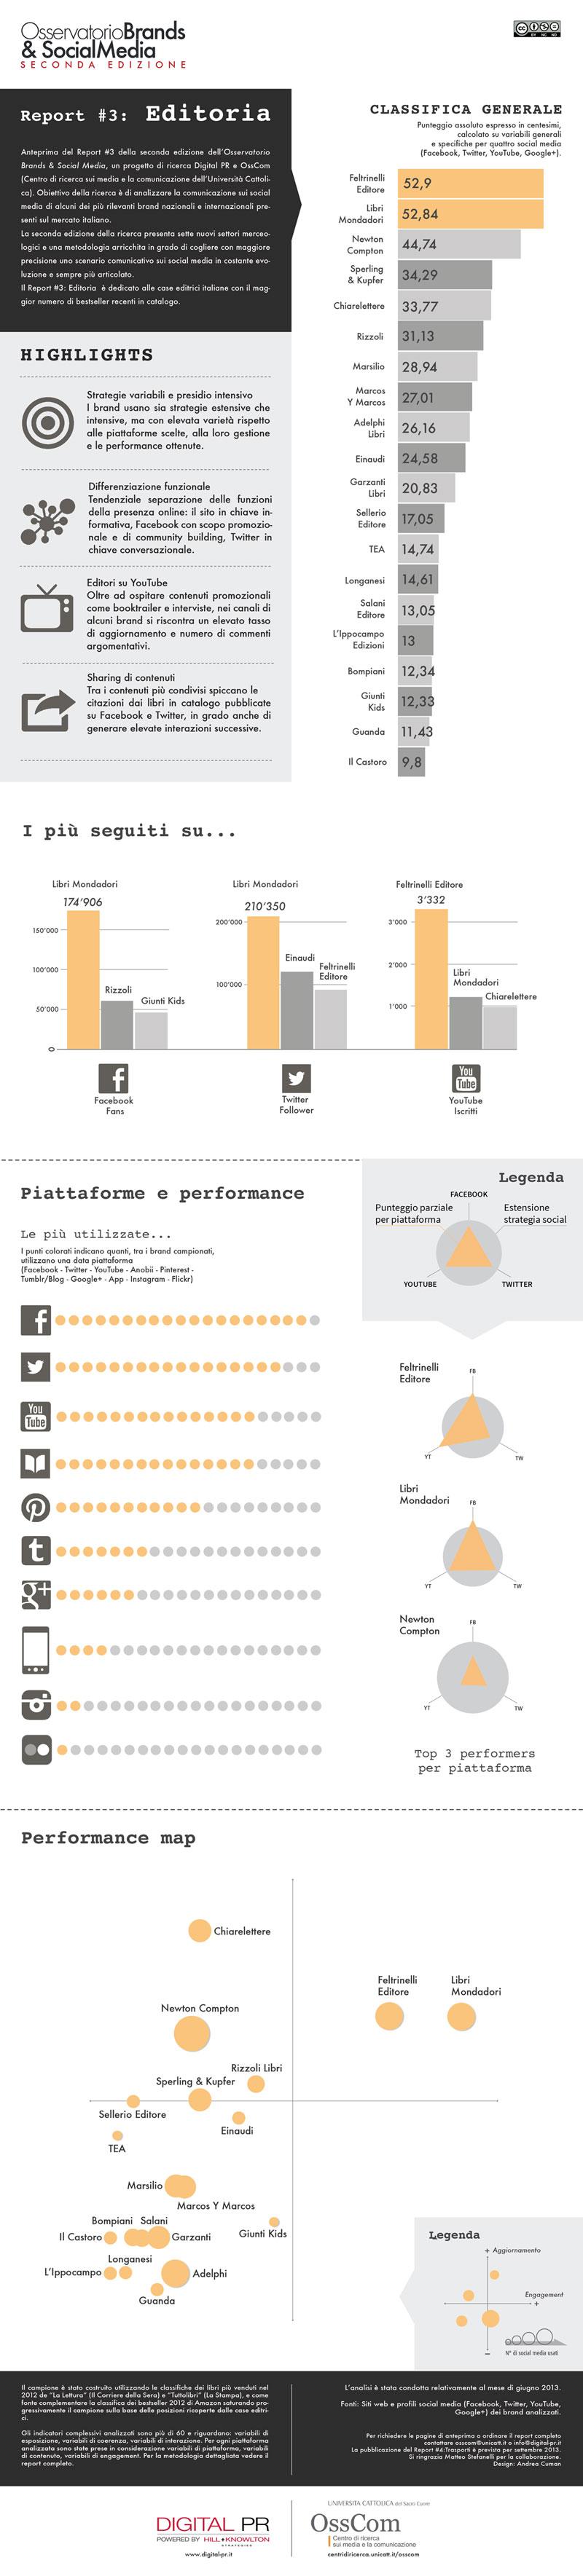 Brands-&-Social-Media---infografica---editoria